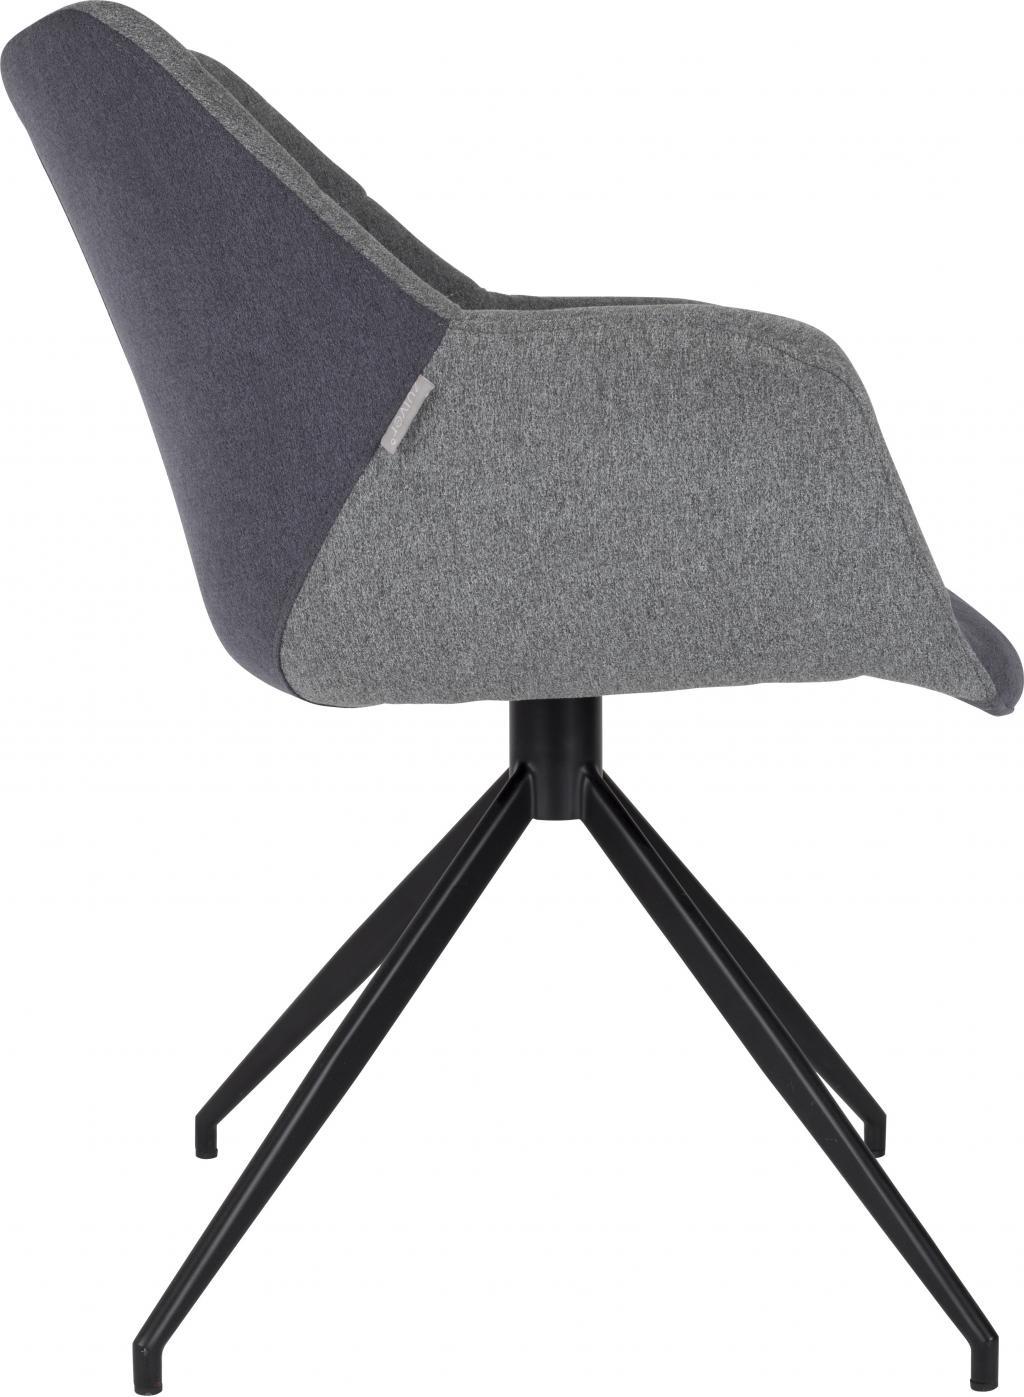 zuiver esszimmerstuhl doulton grau mit armlehnen. Black Bedroom Furniture Sets. Home Design Ideas